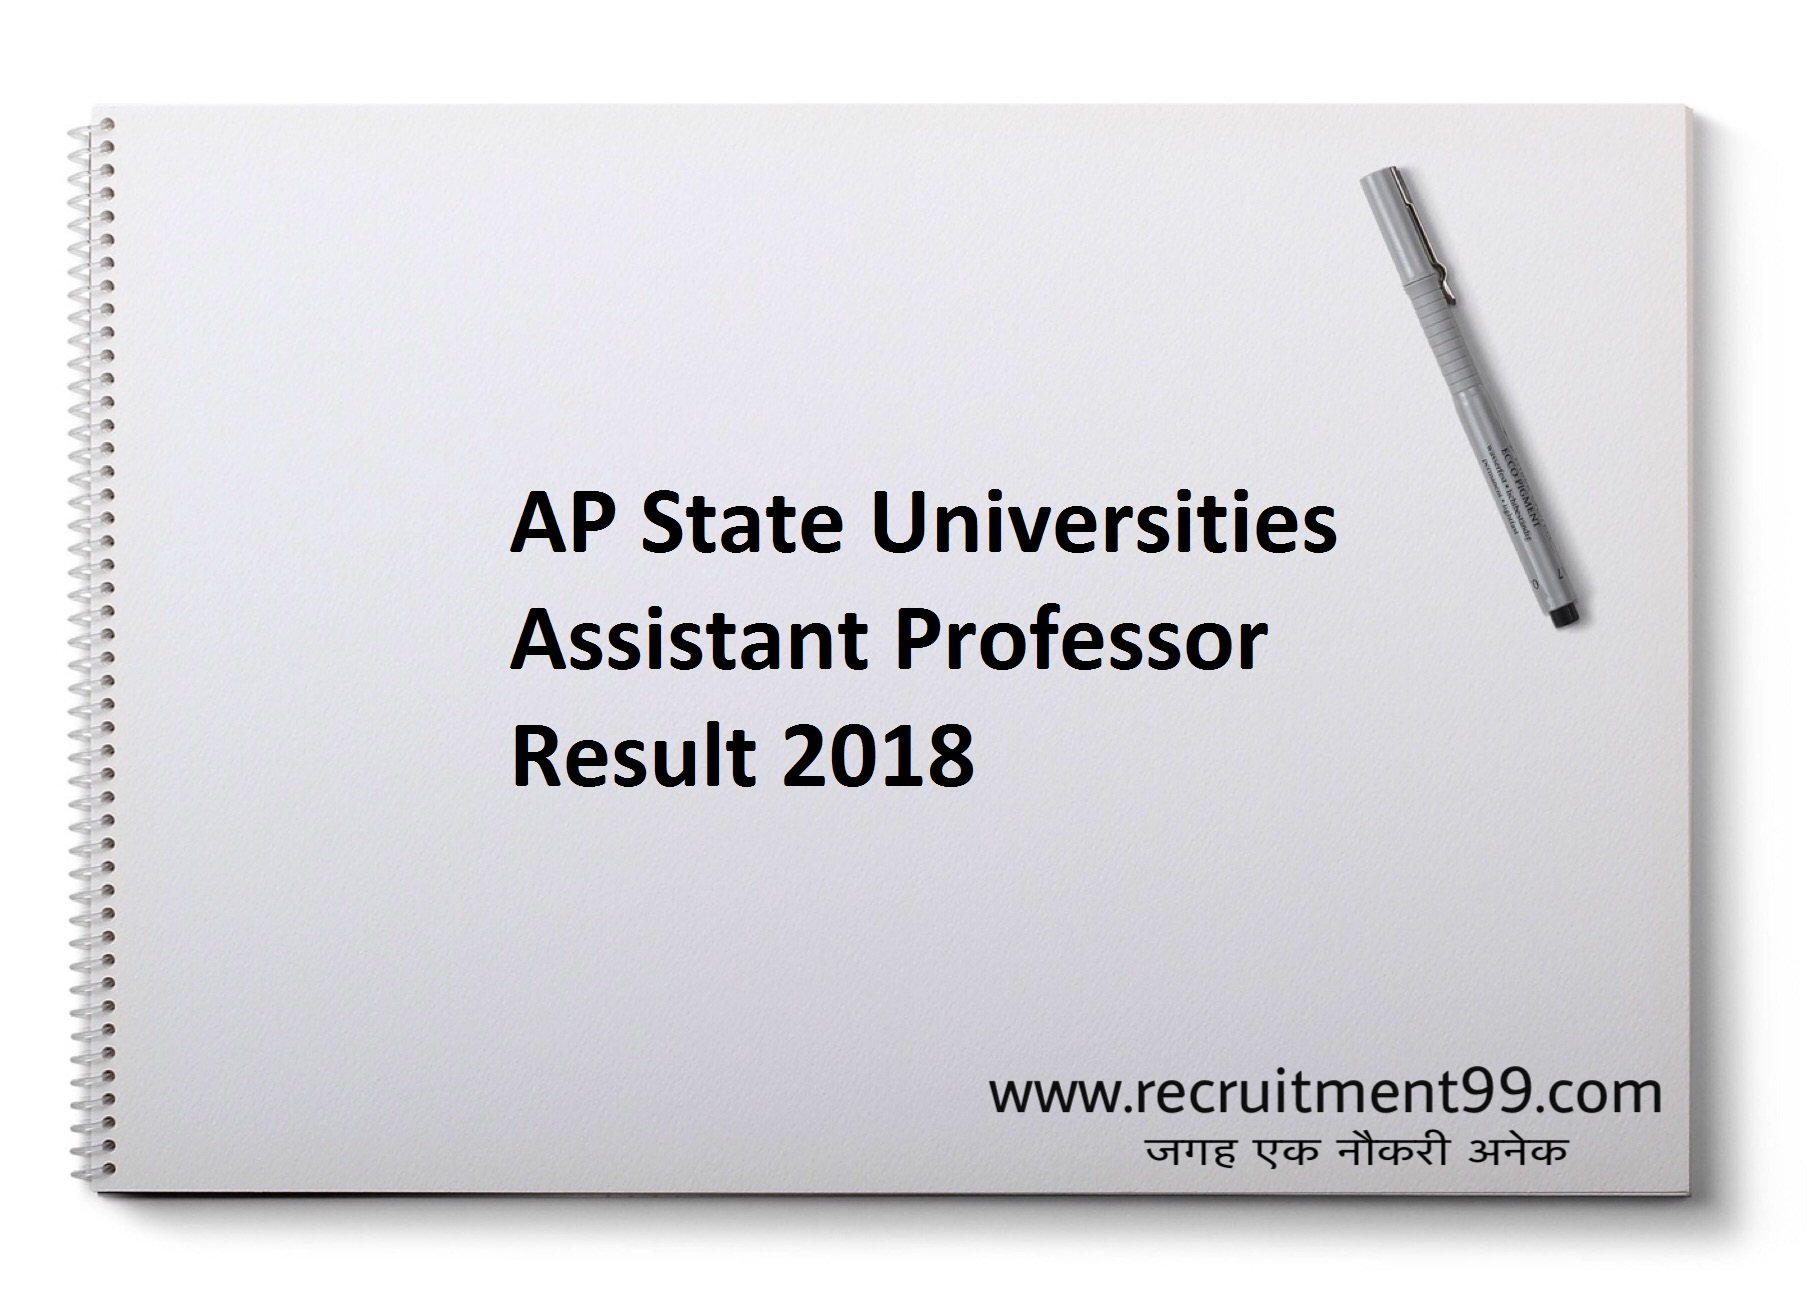 AP Universities Assistant Professor Recruitment Admit Card Result 2018